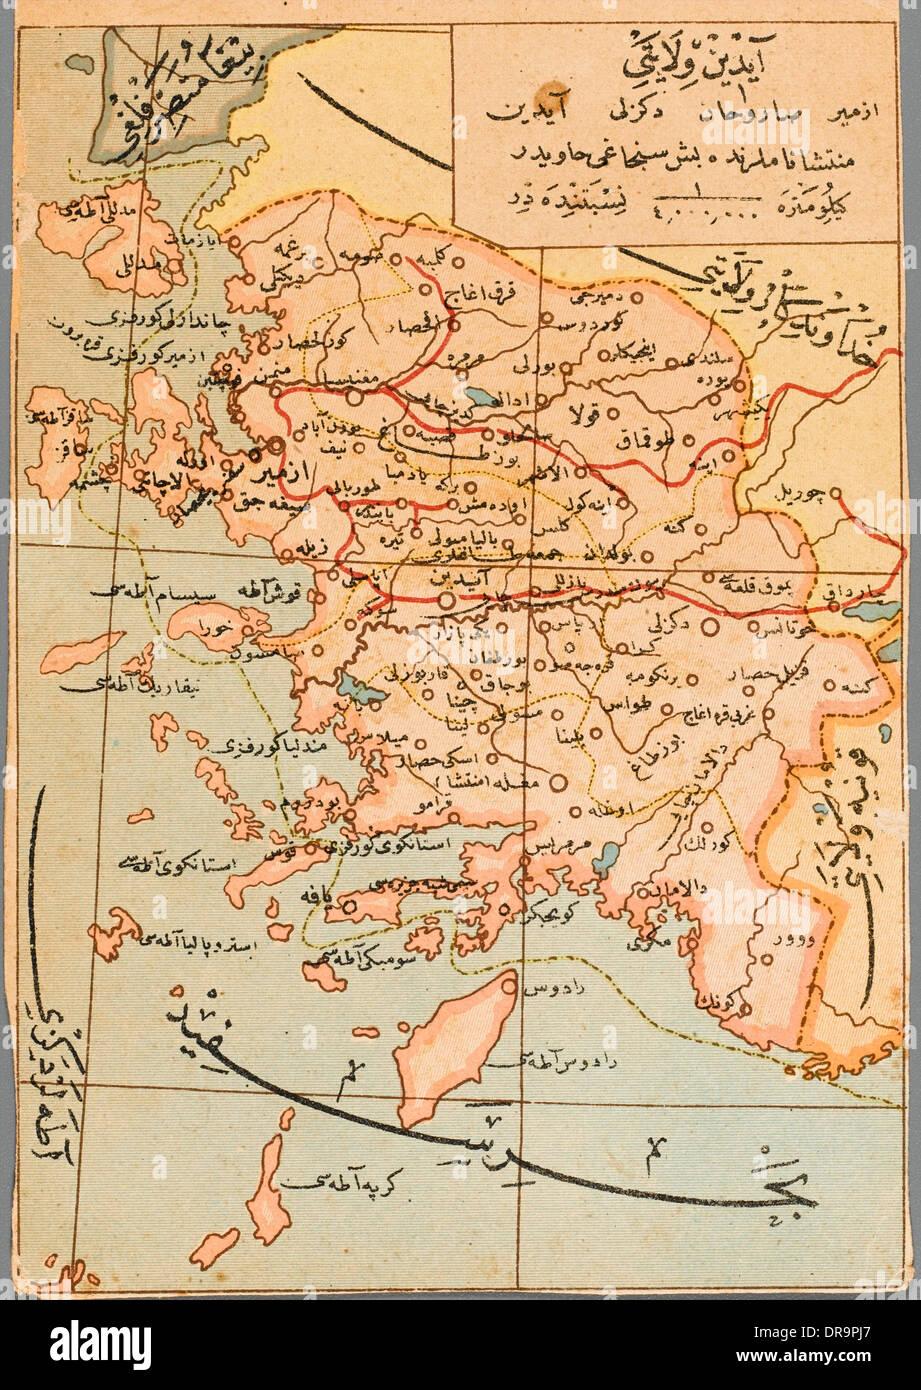 Izmir Region Der Turkei Karte Stockfoto Bild 65983519 Alamy